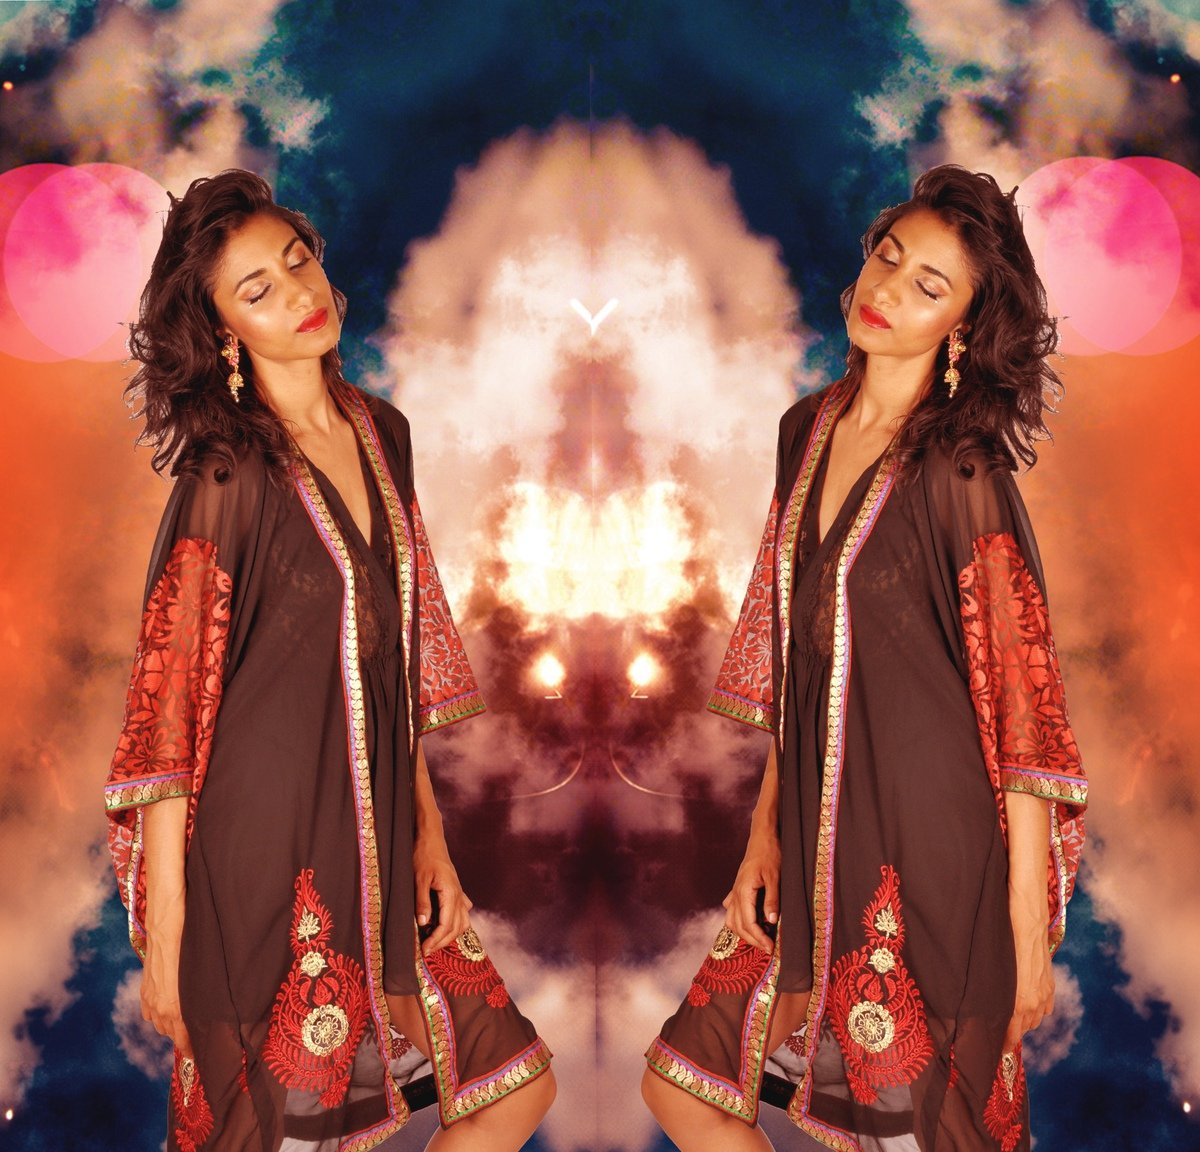 goddess art collage photos1